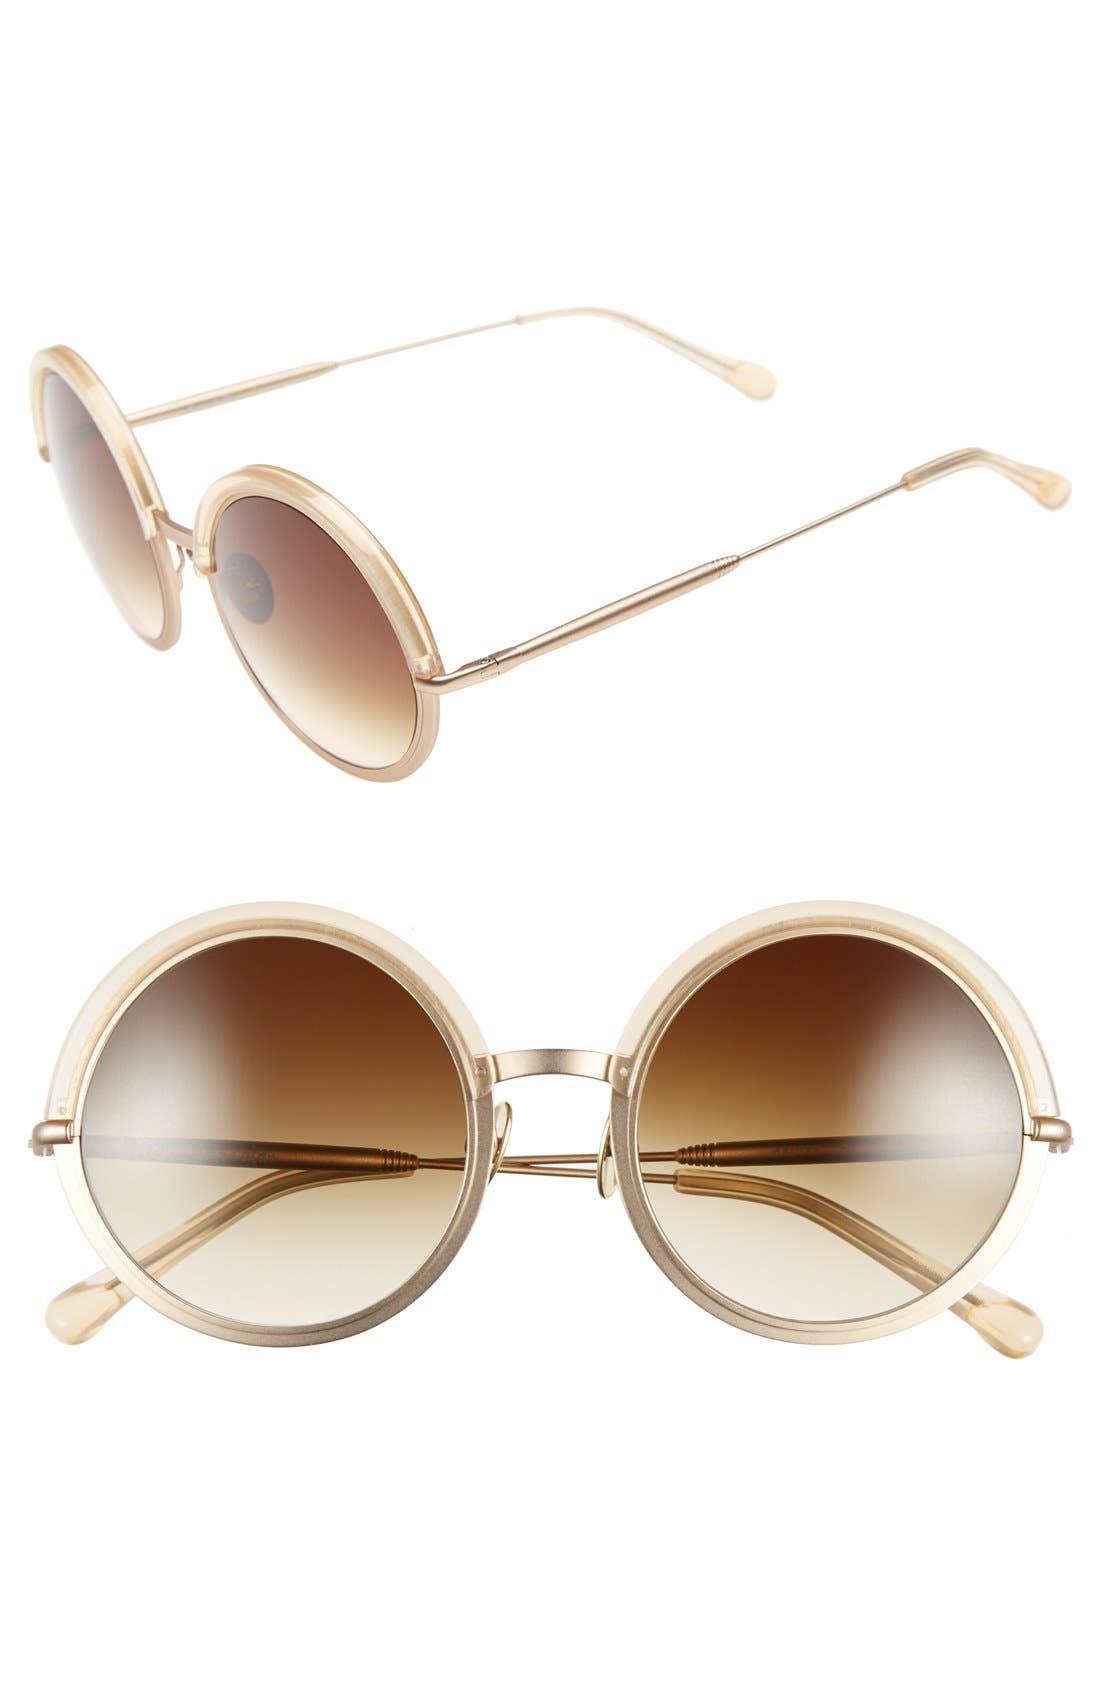 Alternate Image 1 Selected - Steven Alan 'Halsey' 50mm Retro Sunglasses